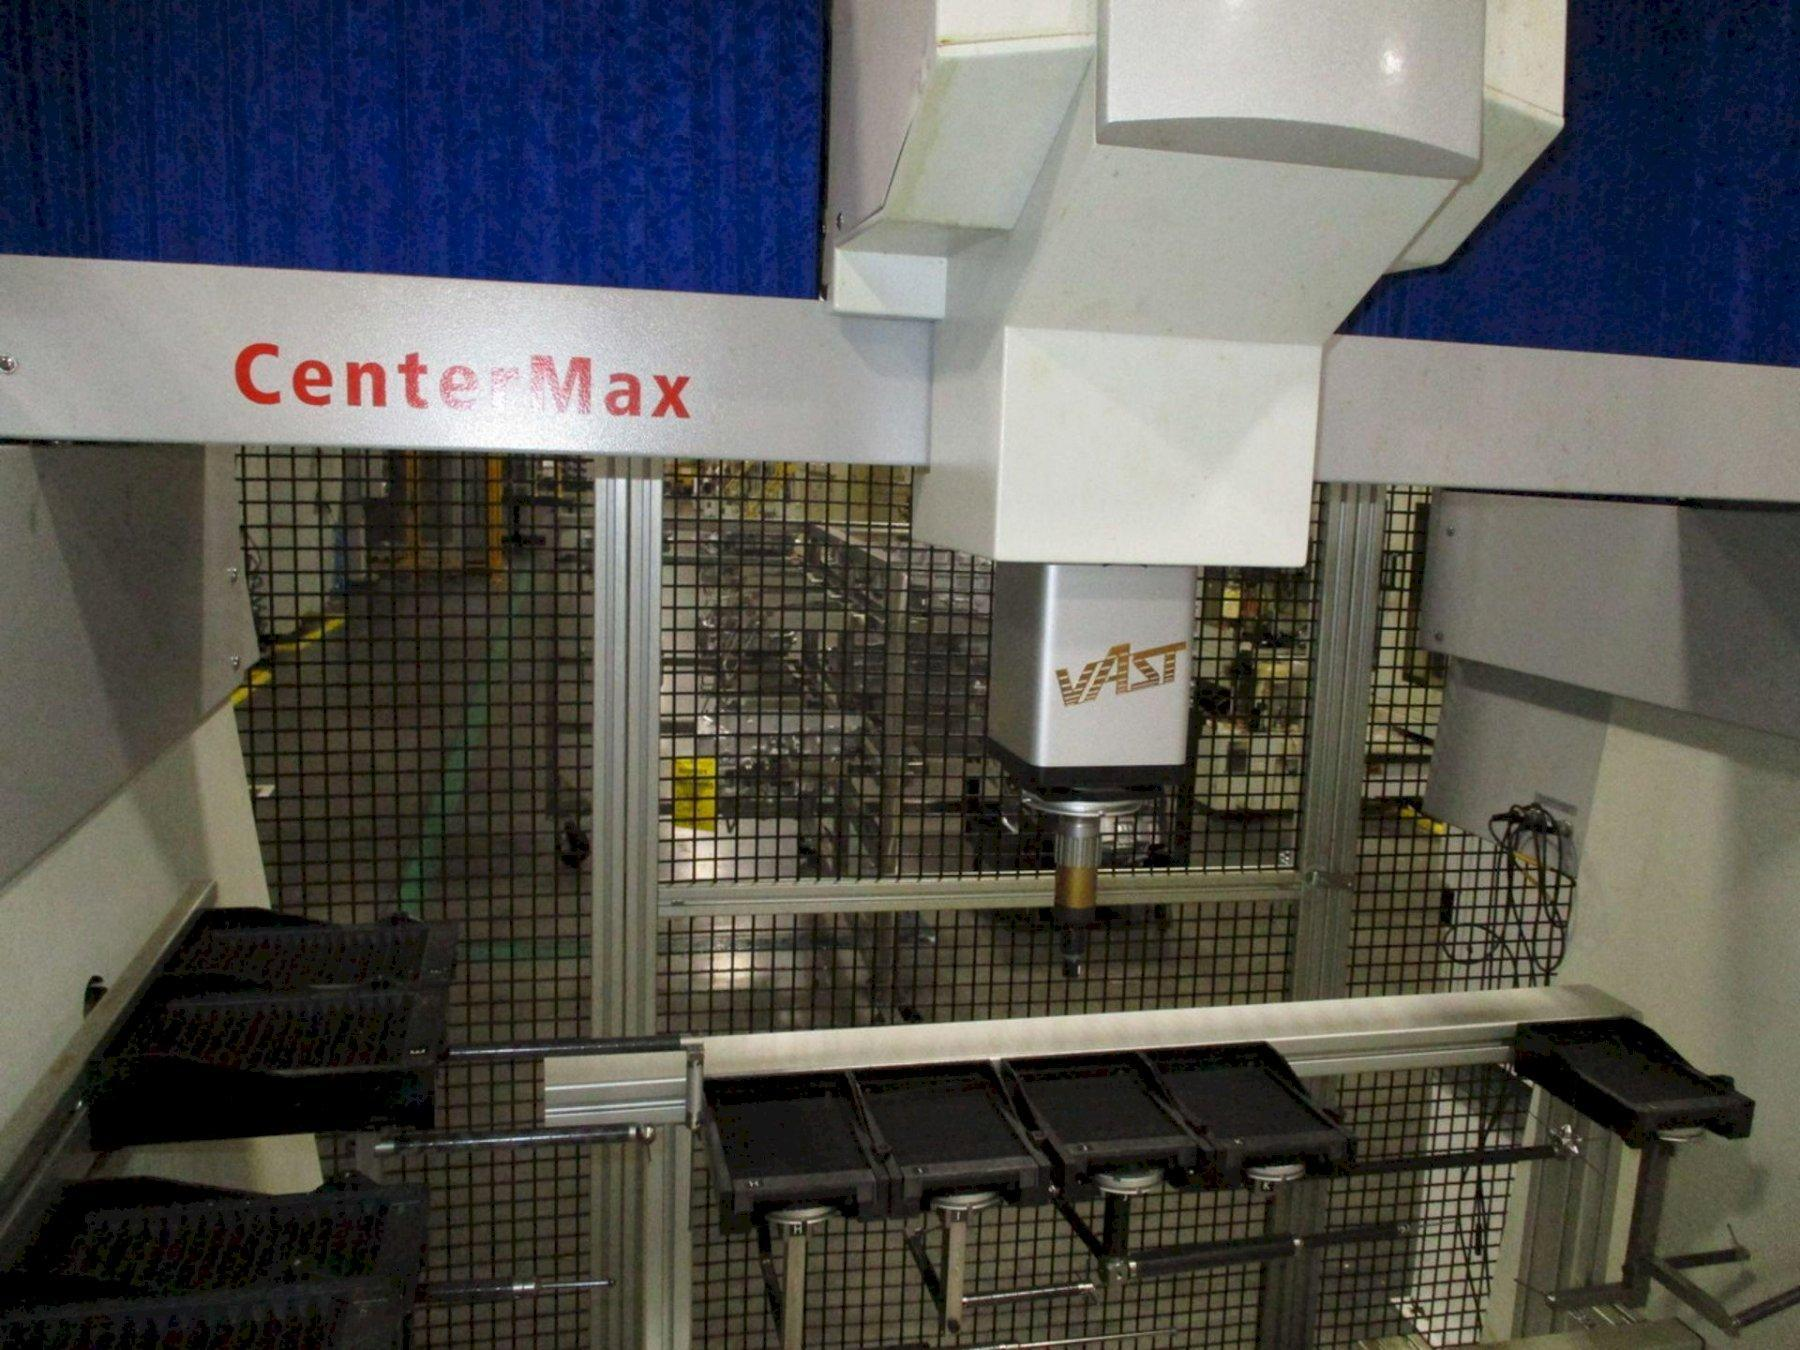 ZEISSZeiss Centermax Navigator 11/12/9 Coordinate Measuring Machine (CMM)(#33230)